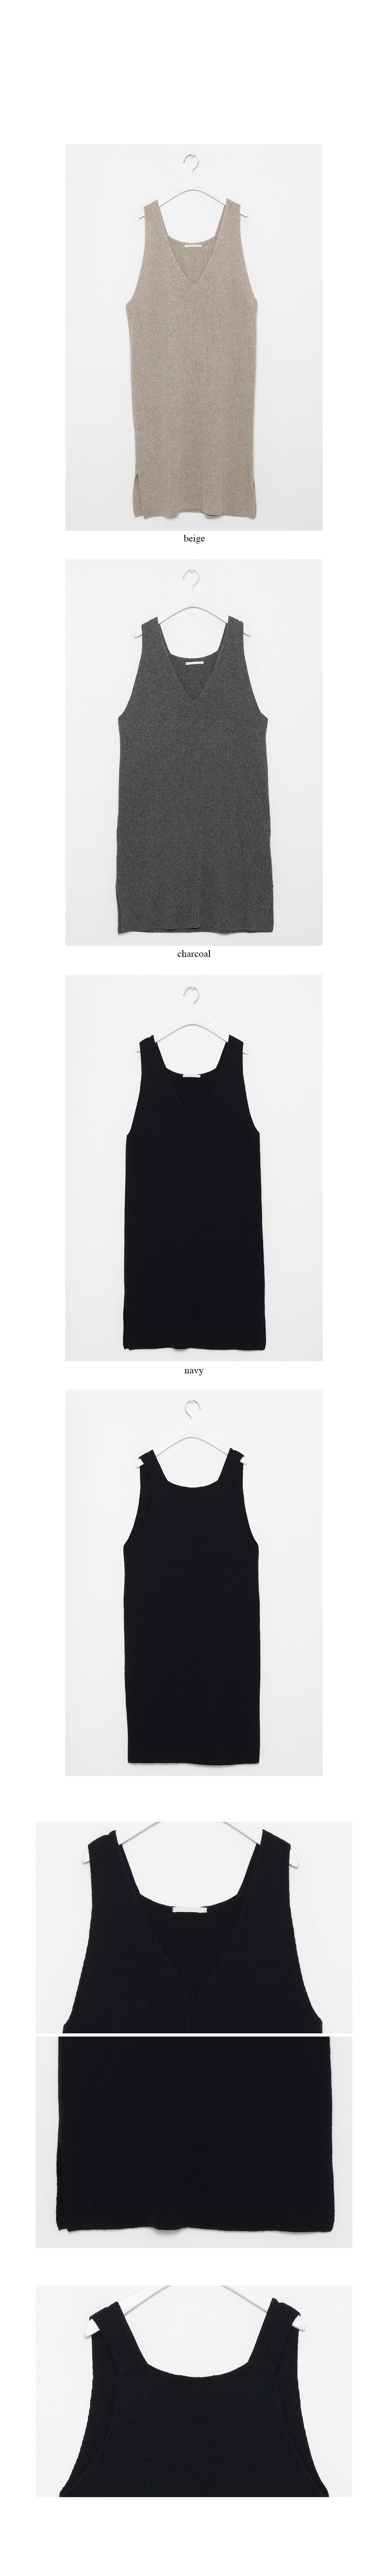 urban v neck dress